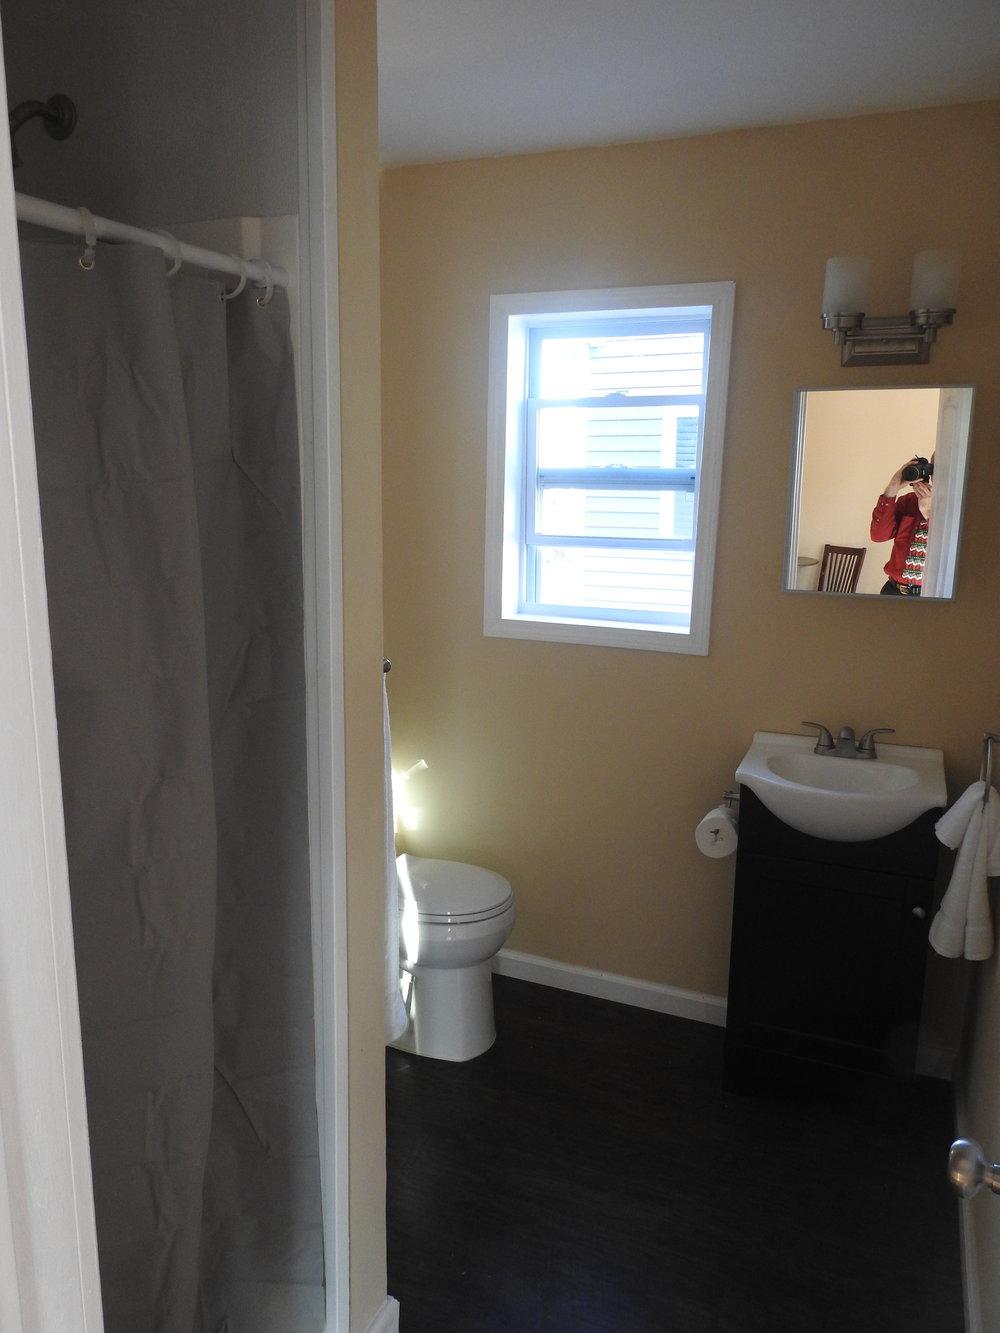 Cozy, but not too cozy, of a bathroom…